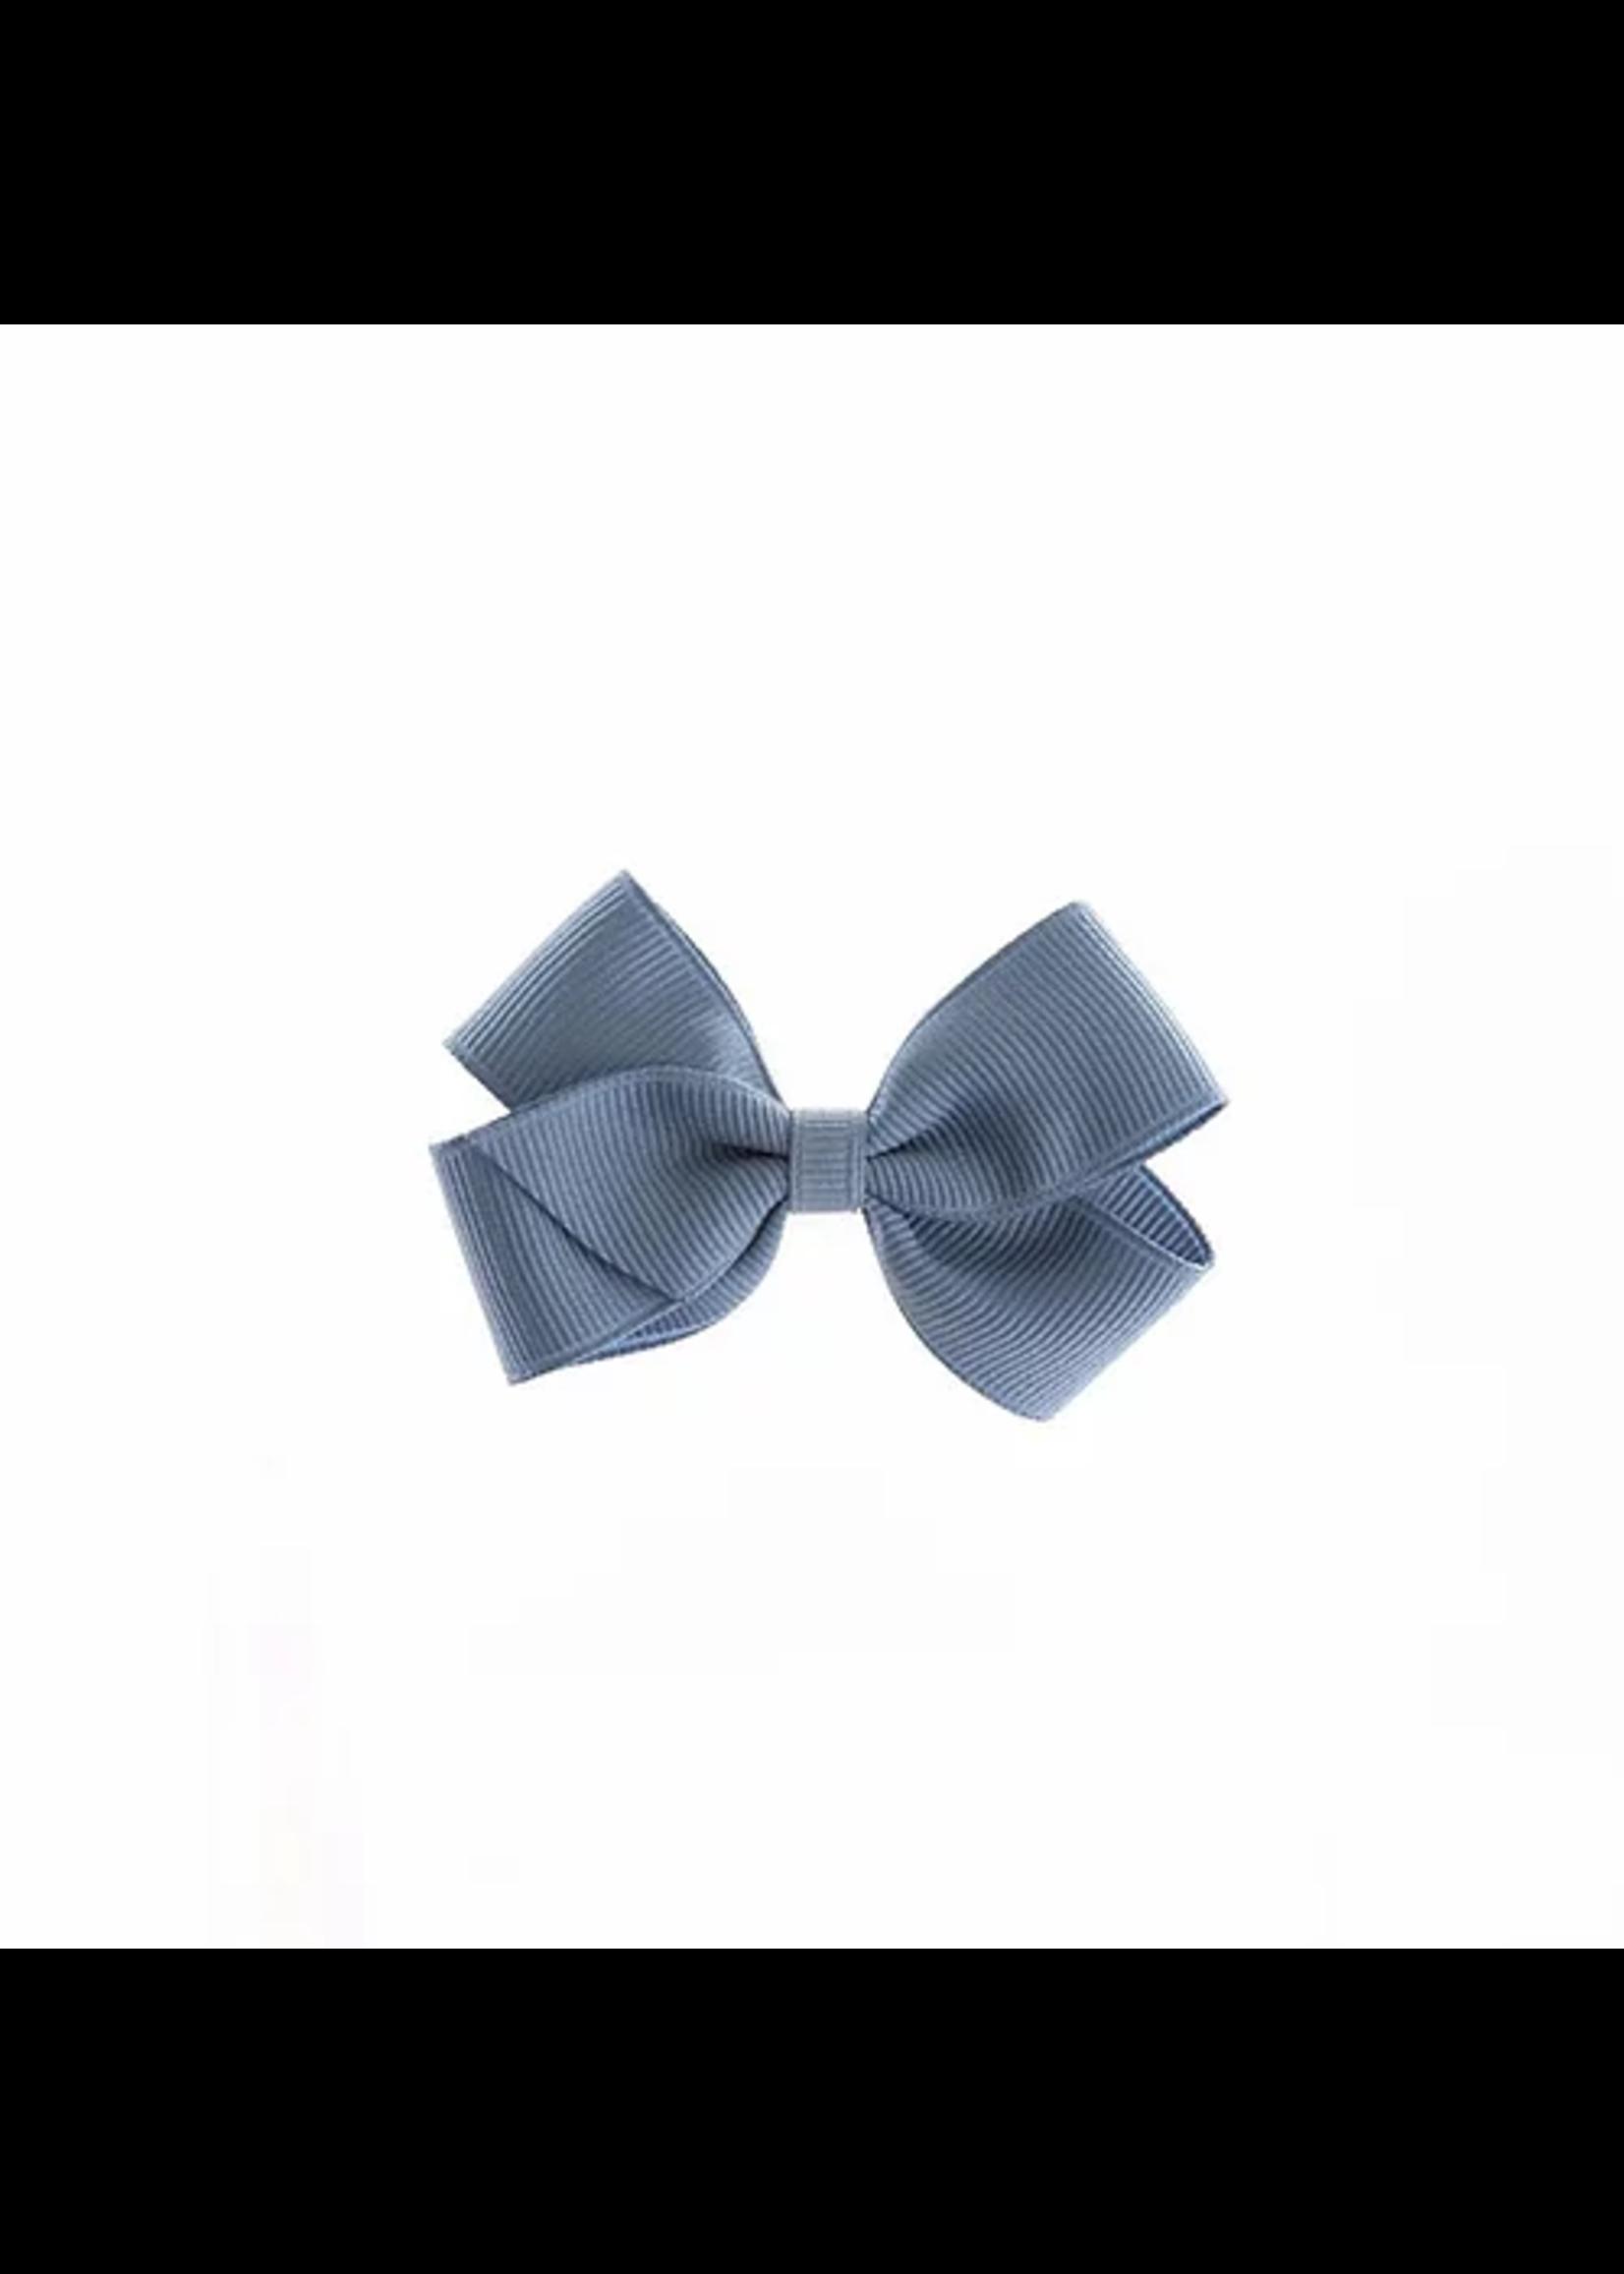 Olilia Small London Bow (Antique Blue)